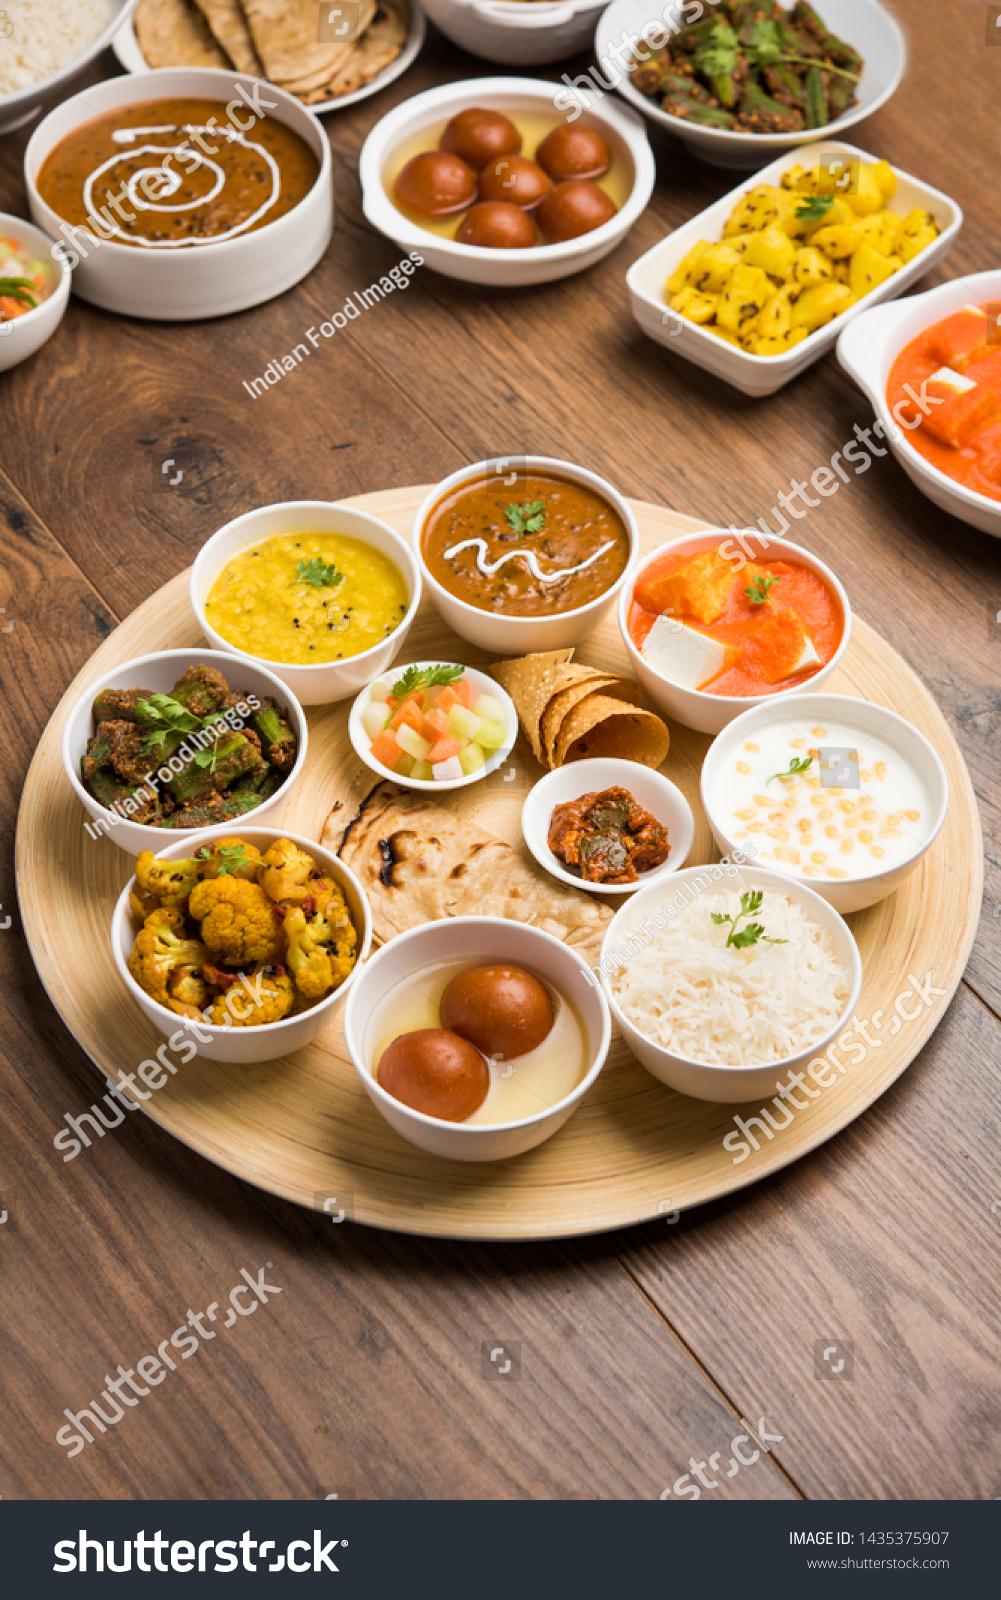 Indian Food Platter Hindu Veg Thali Stock Photo Edit Now 1435375907